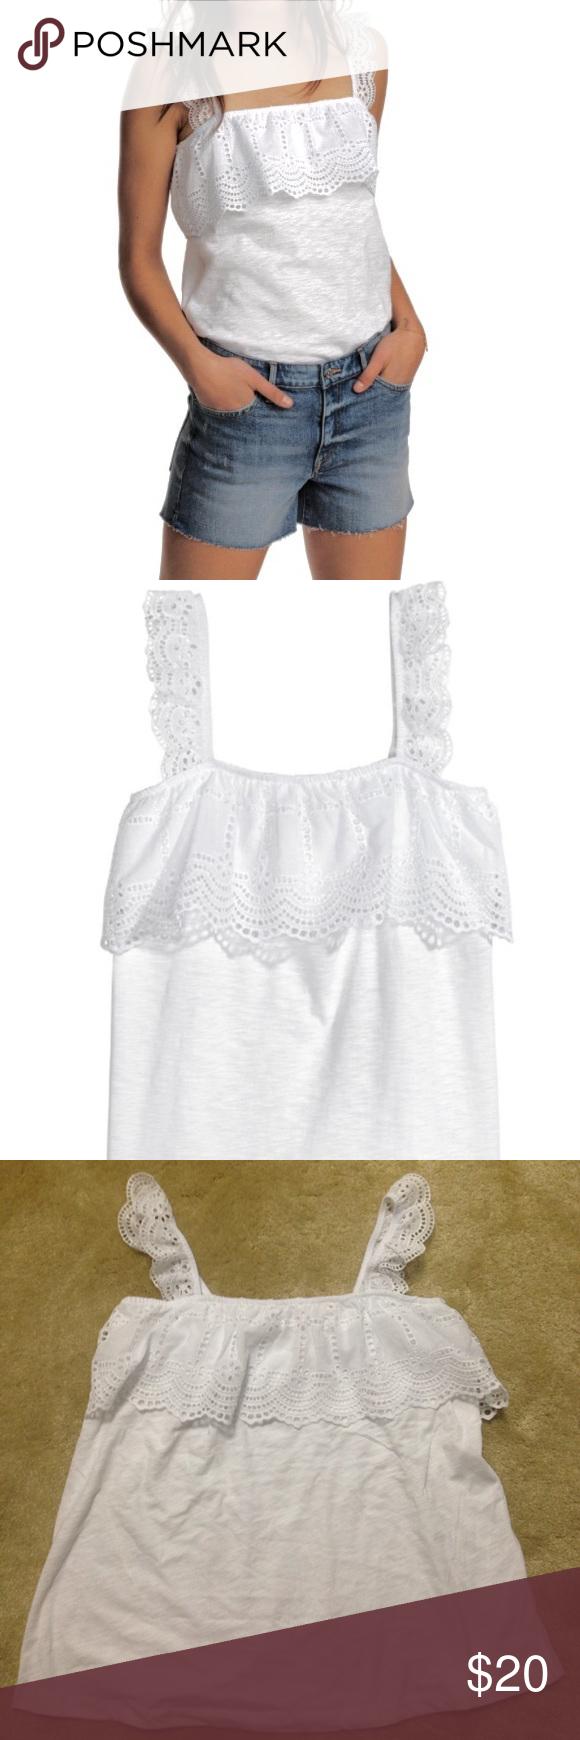 H&m lace dress white  HuM white ruffle eyelet embroidered top NWT  My Posh Picks